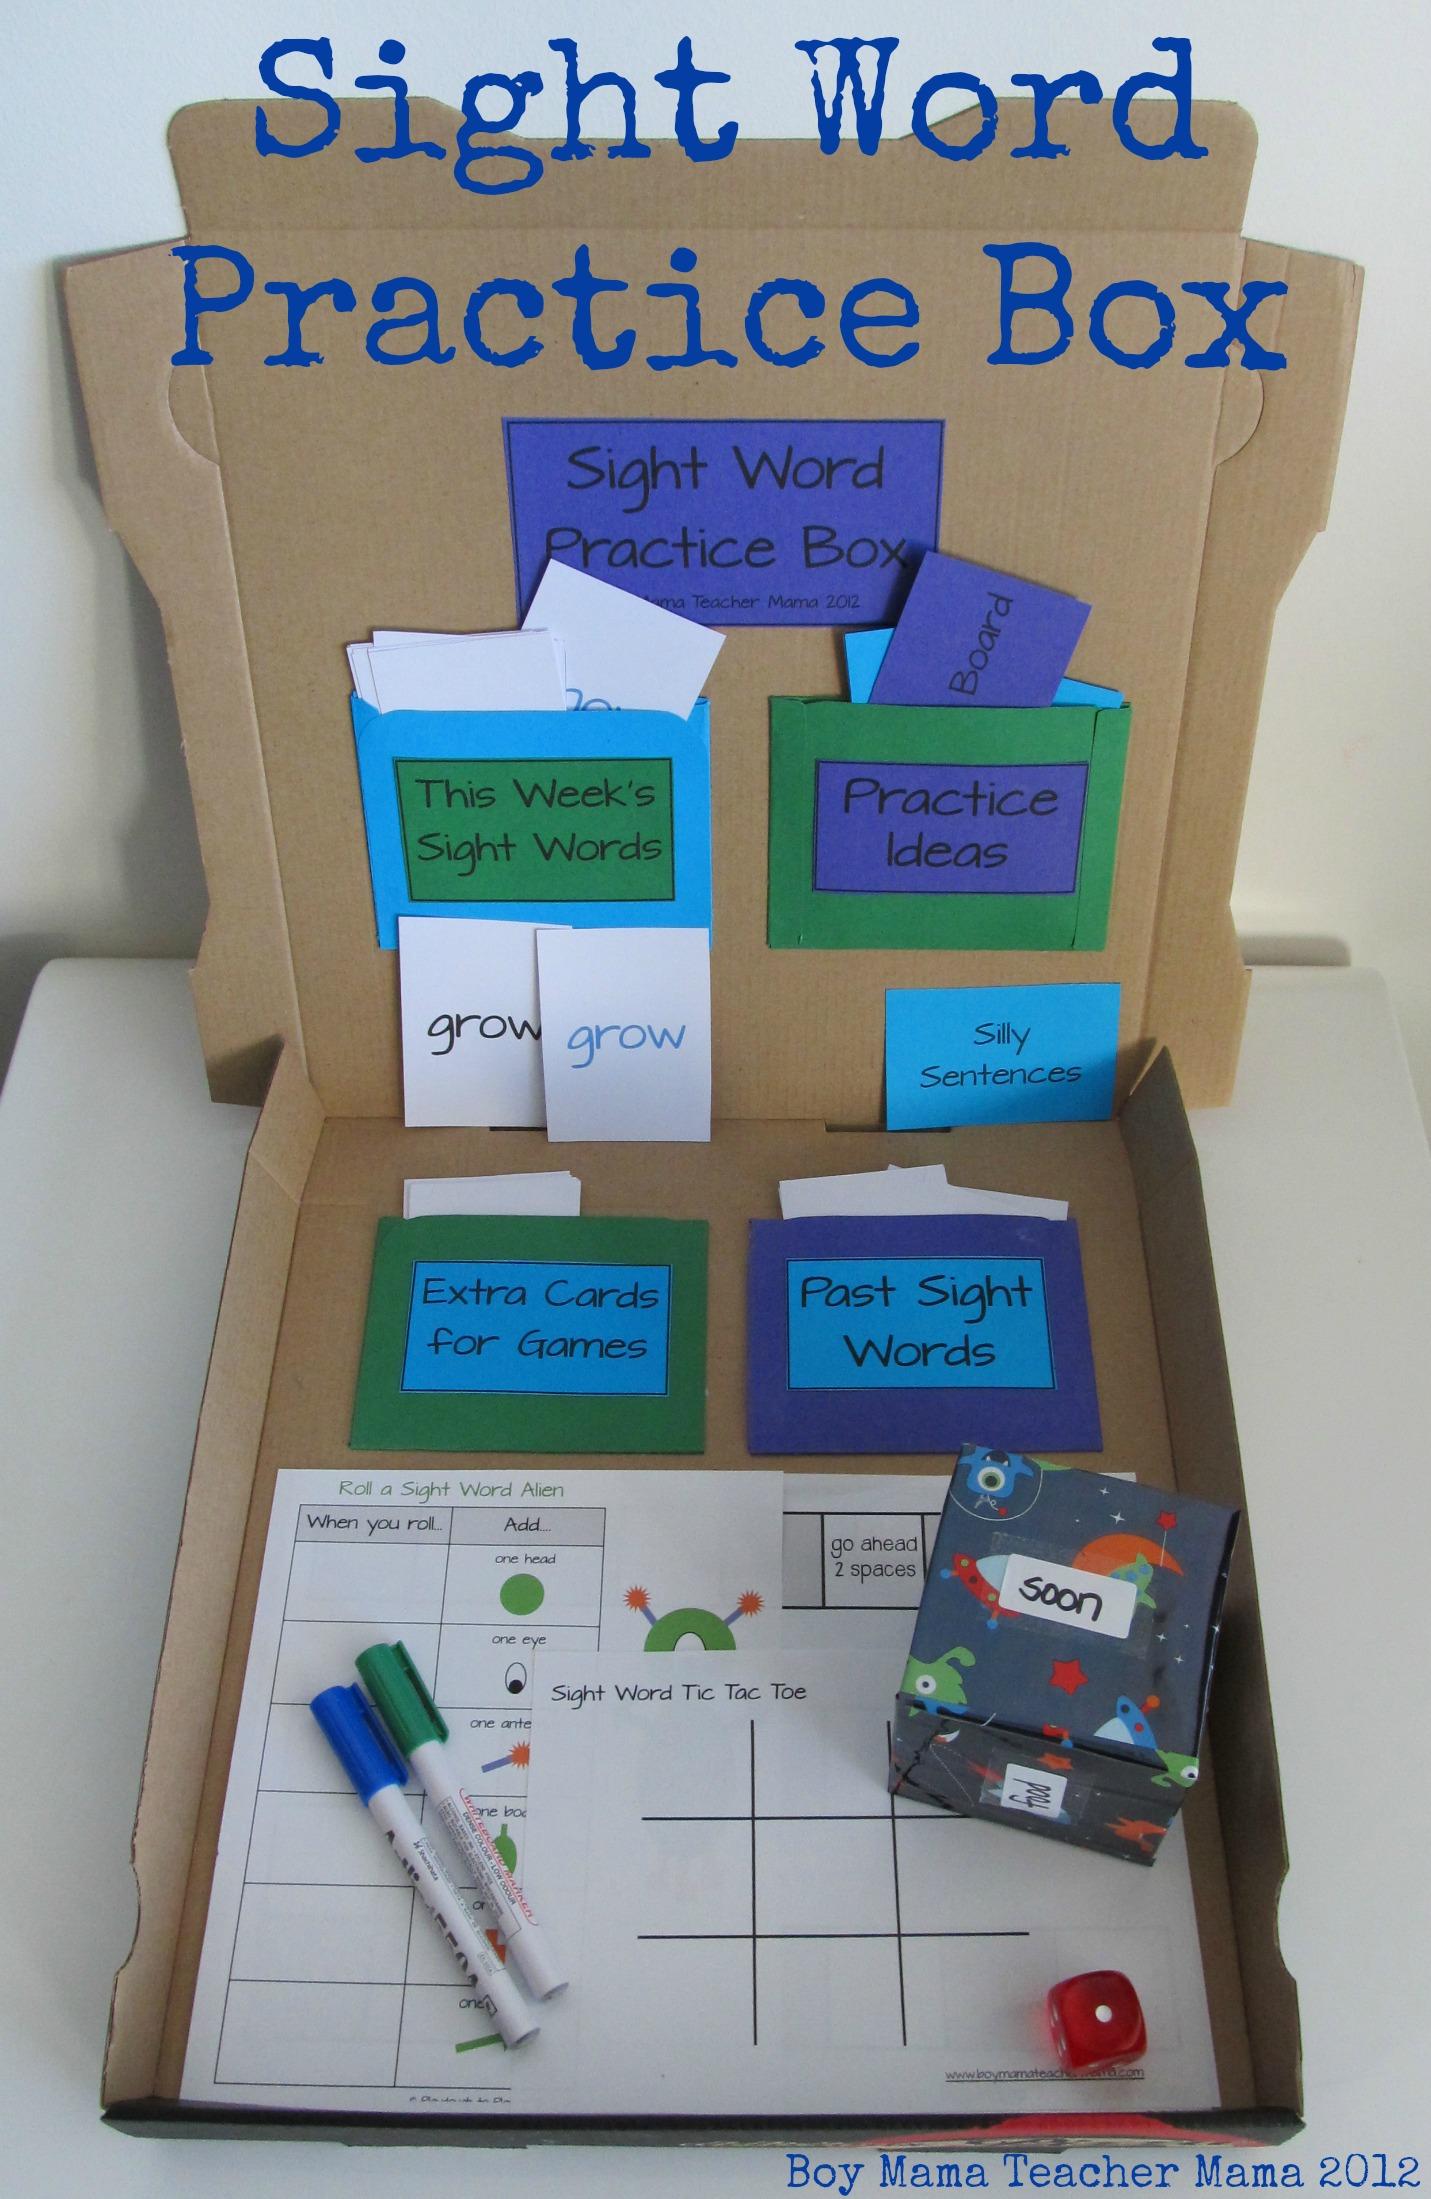 Boy Mama Teacher Mama | Sight Word Practice Box